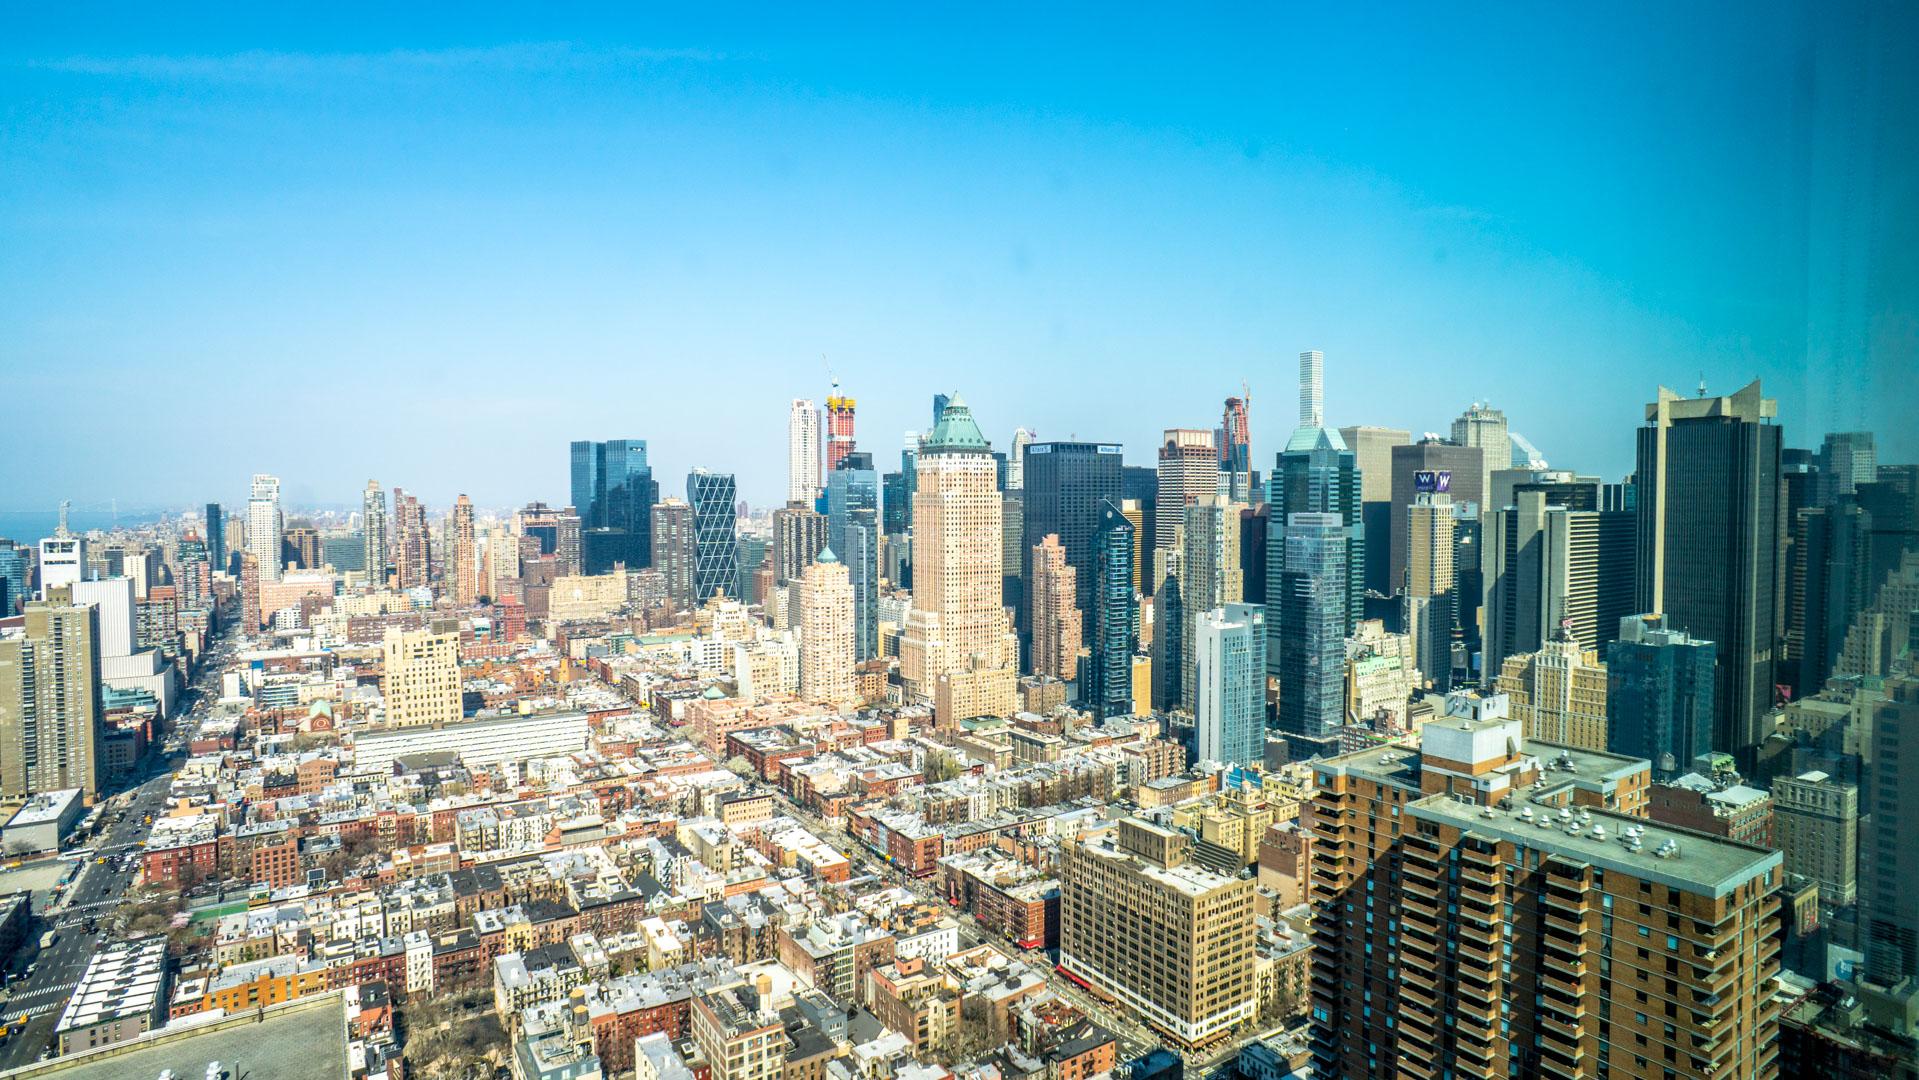 460 West 42nd Street Clinton New York NY 10036